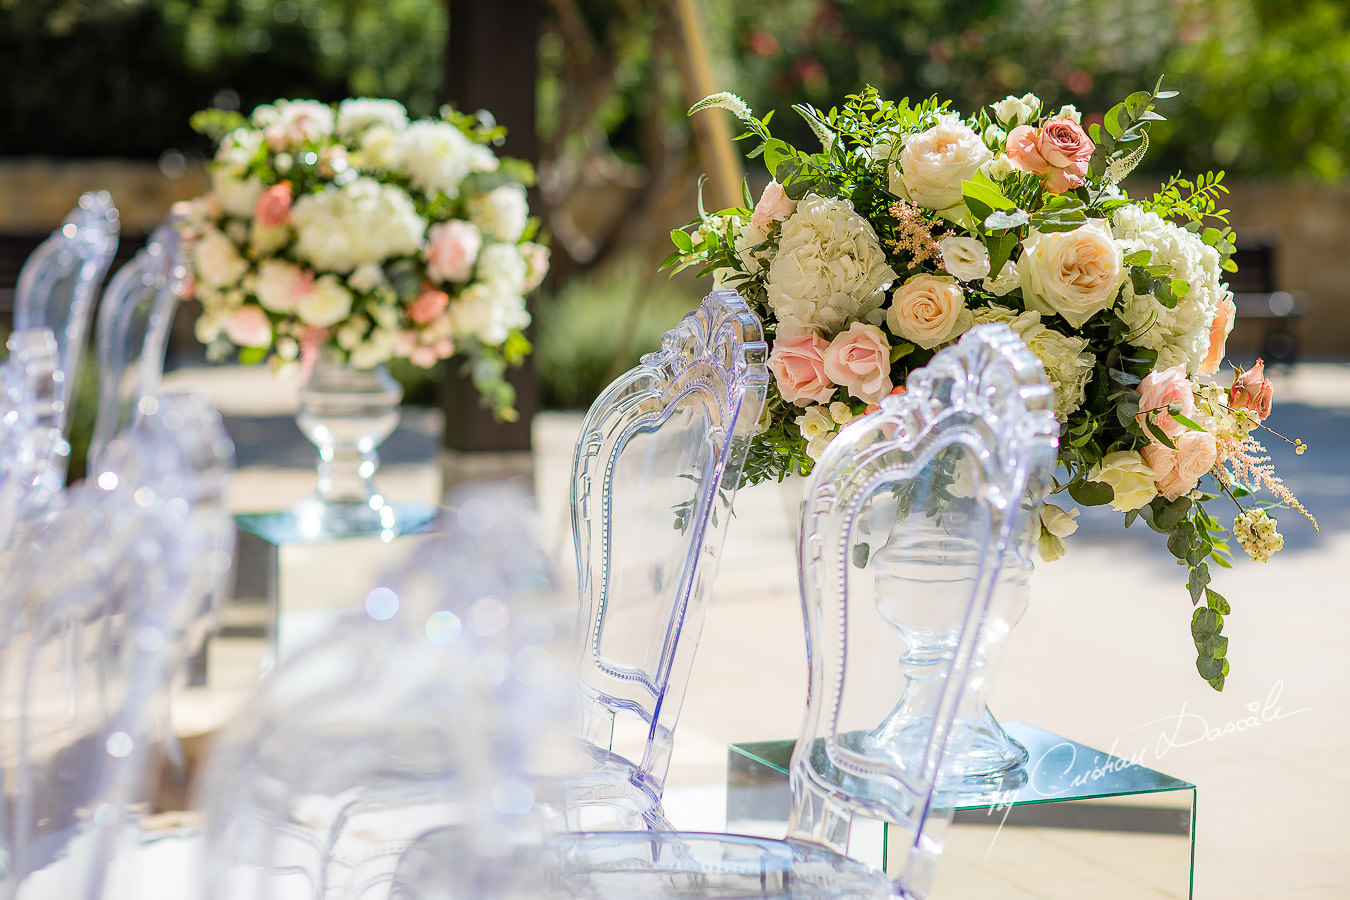 Beautiful wedding flowers captured by Cristian Dascalu during an elegant Aphrodite Hills Wedding in Cyprus.